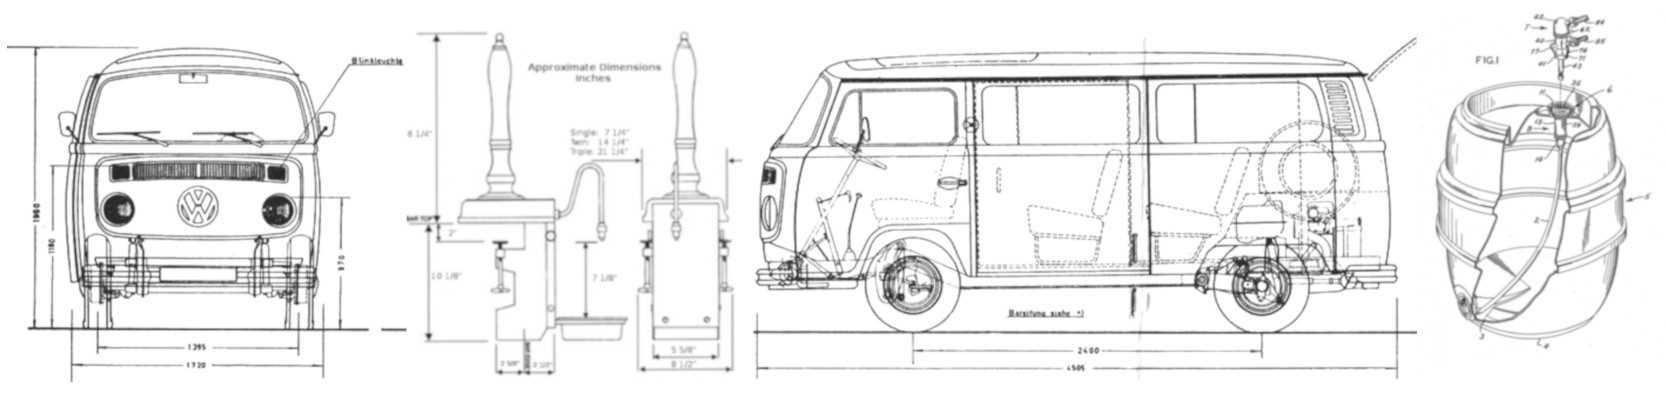 Microbus Gateshead